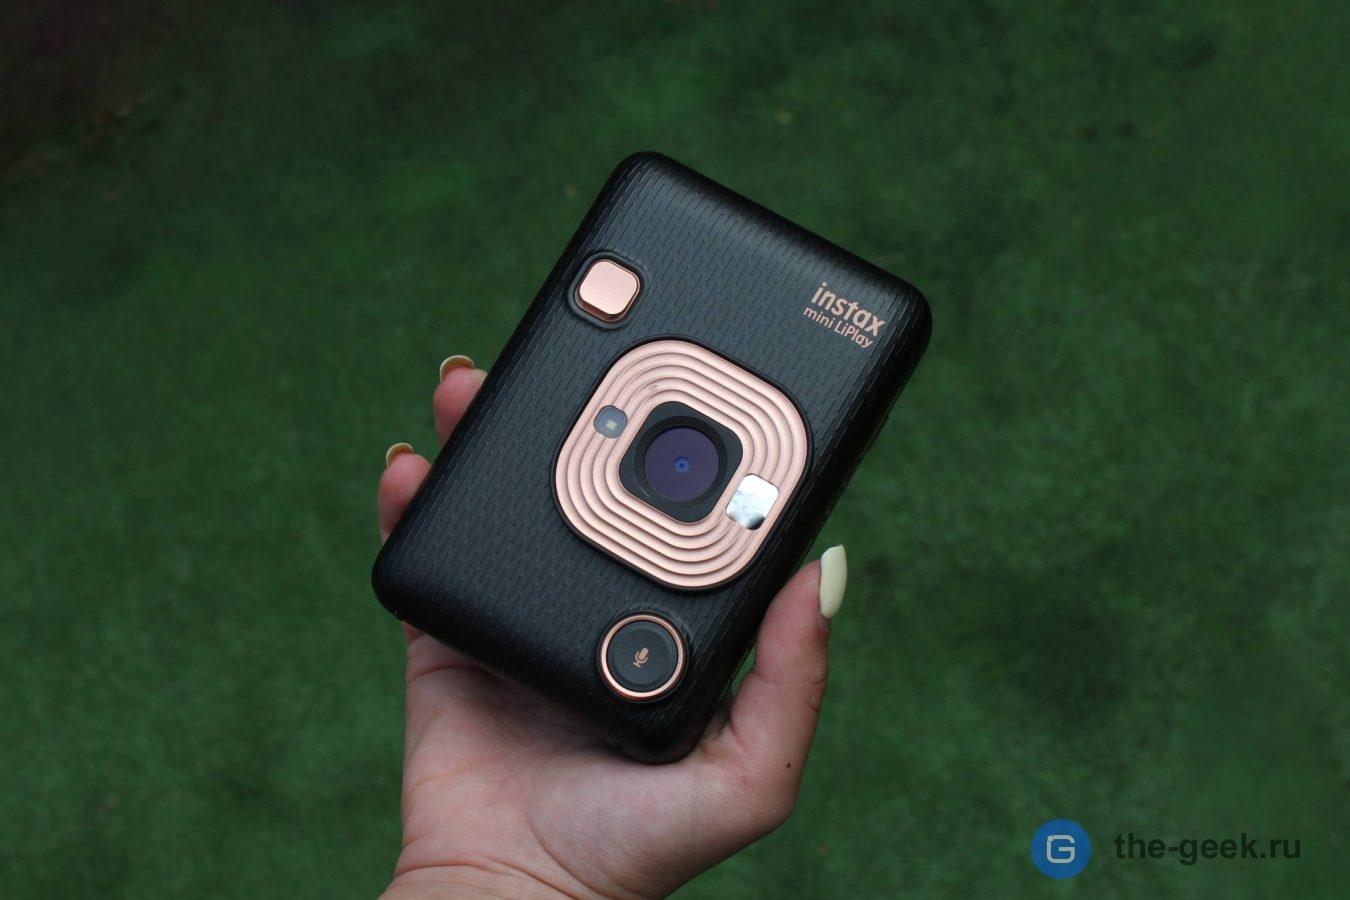 Обзор Instax Mini LiPlay: фотокарточки со звуком